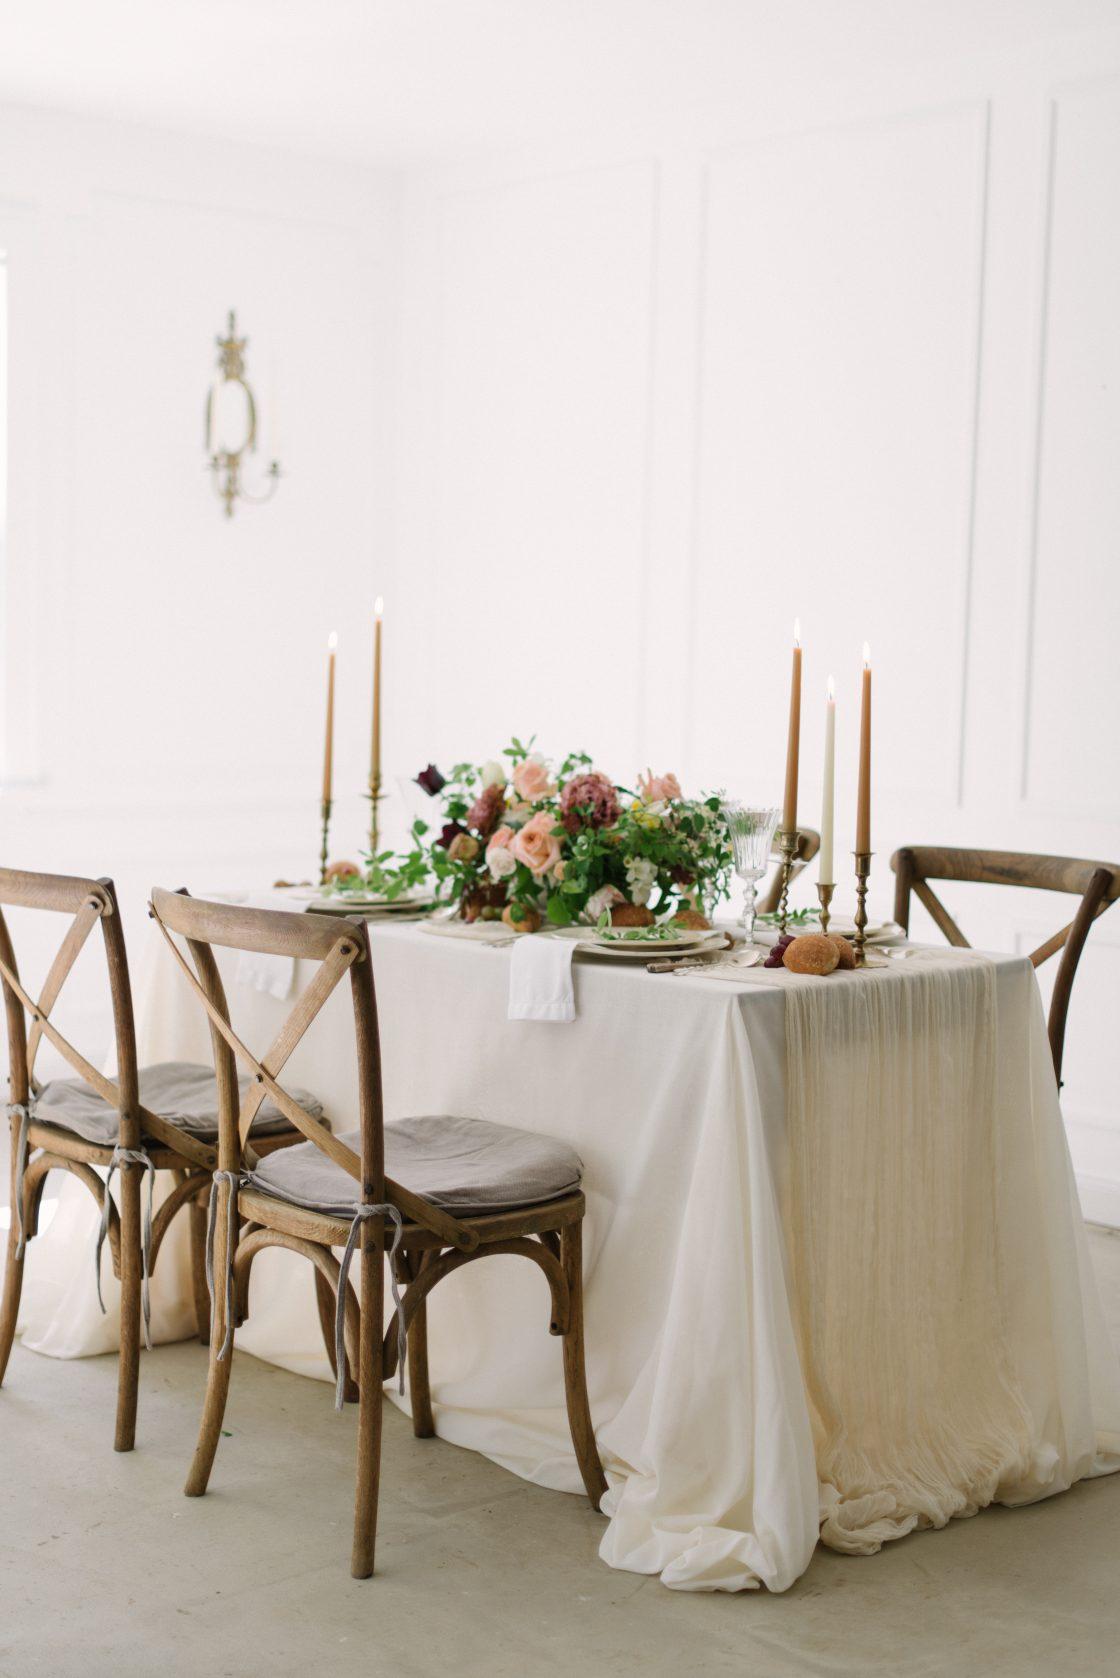 Natural Peach Mauve Wedding Table Centerpiece